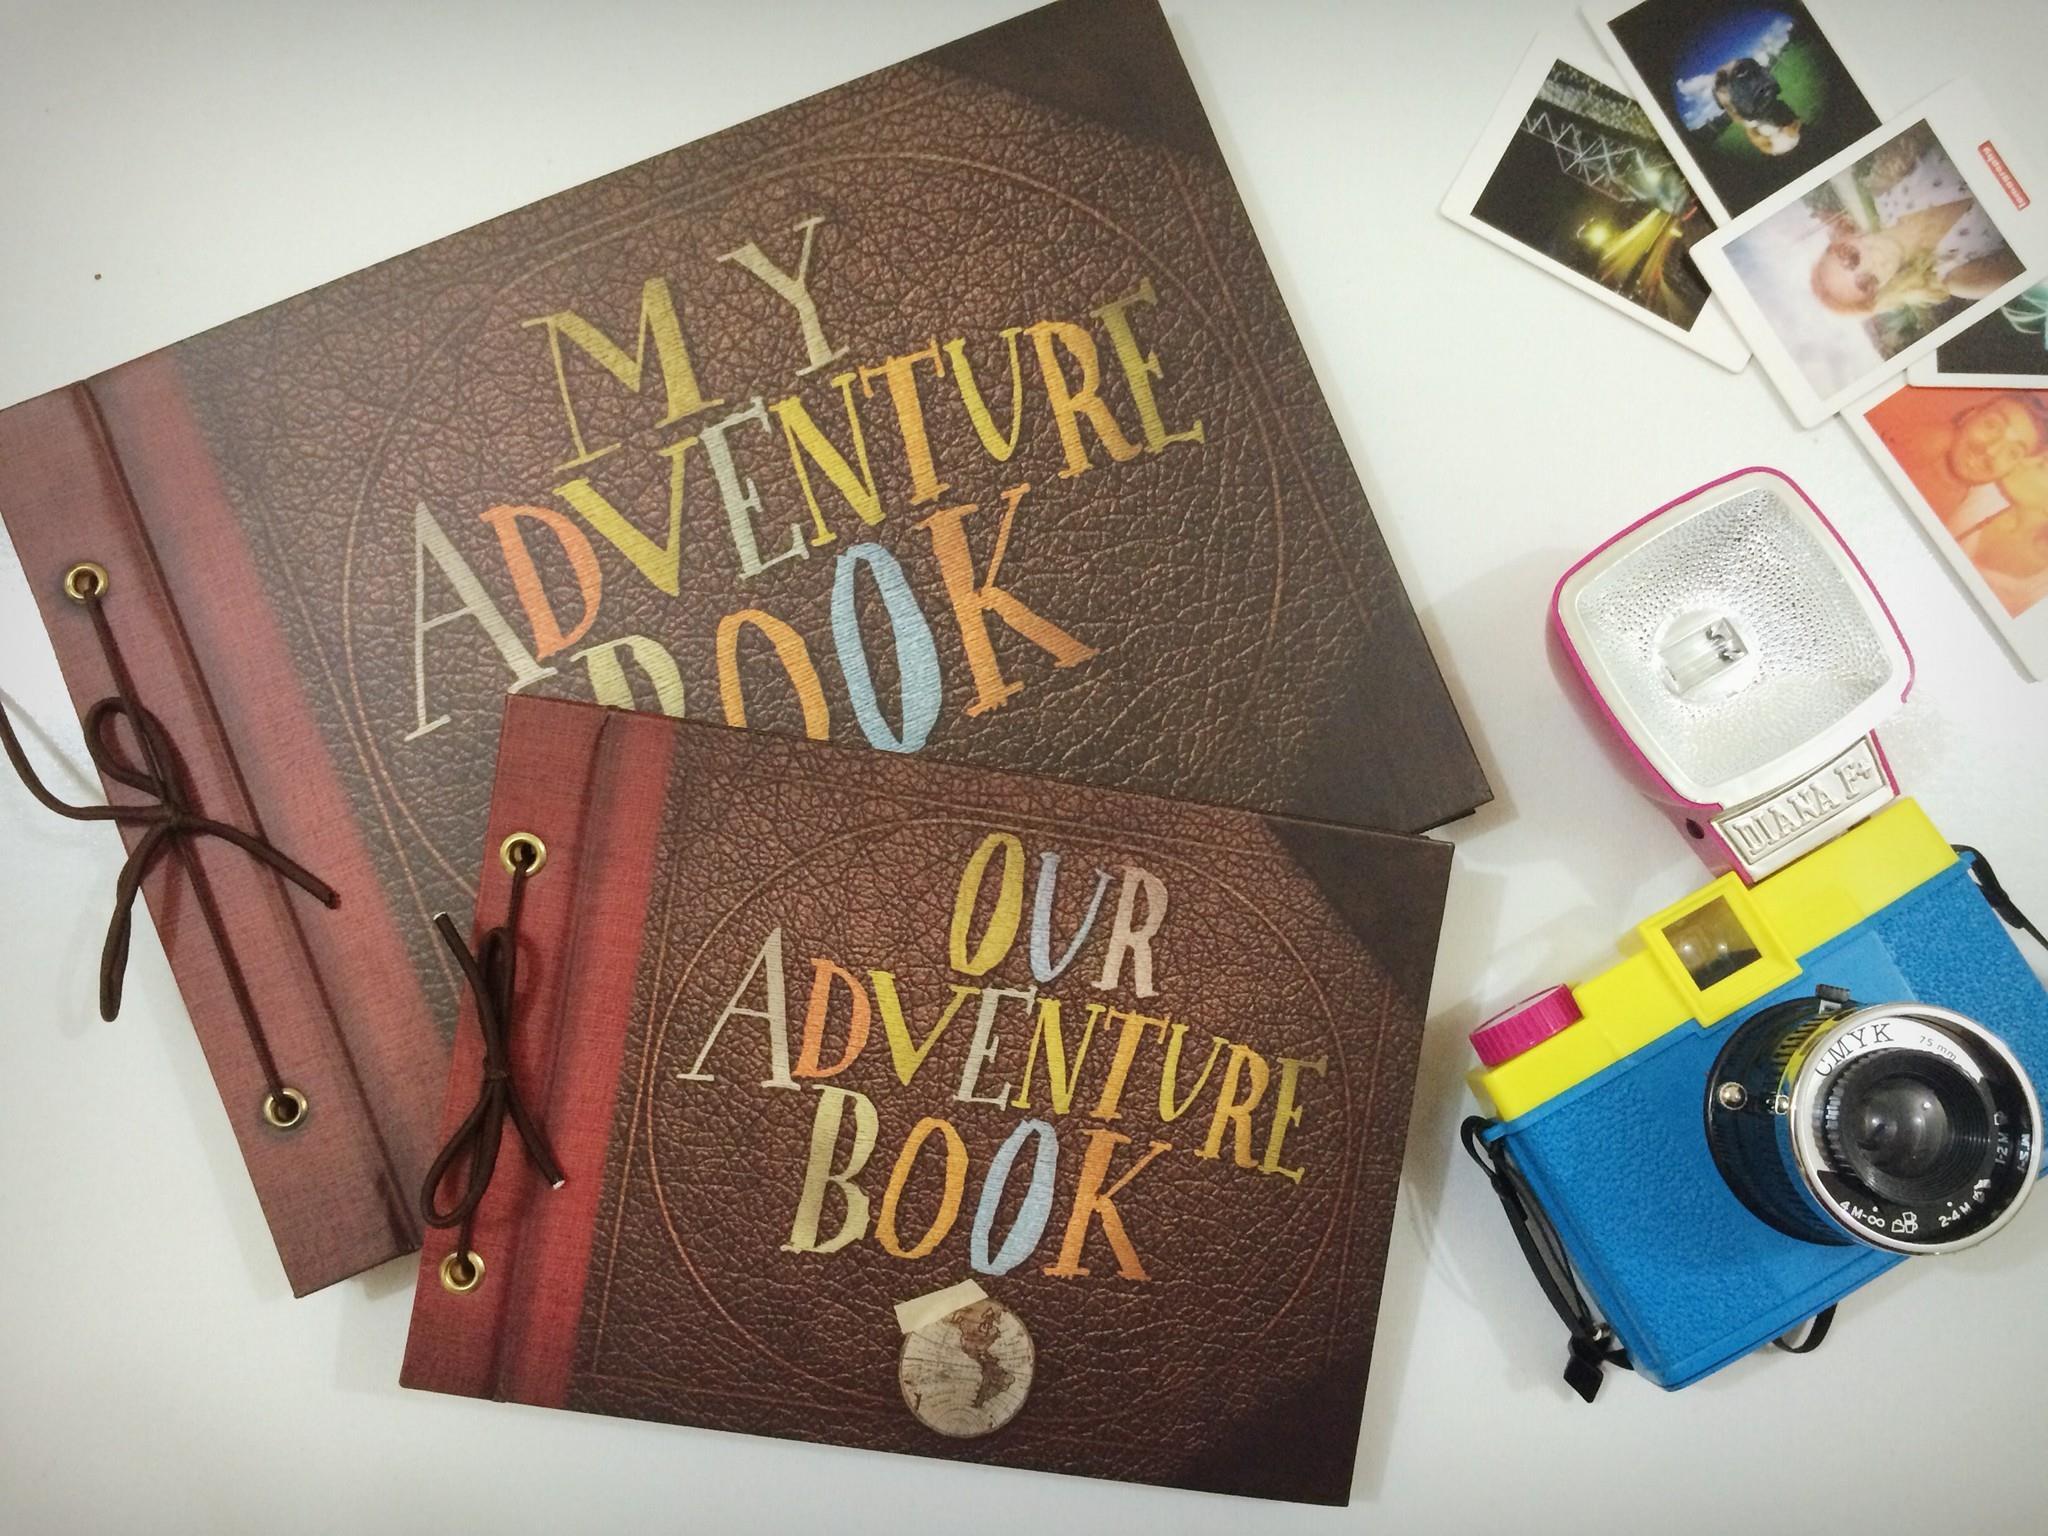 depasada - my adventure book